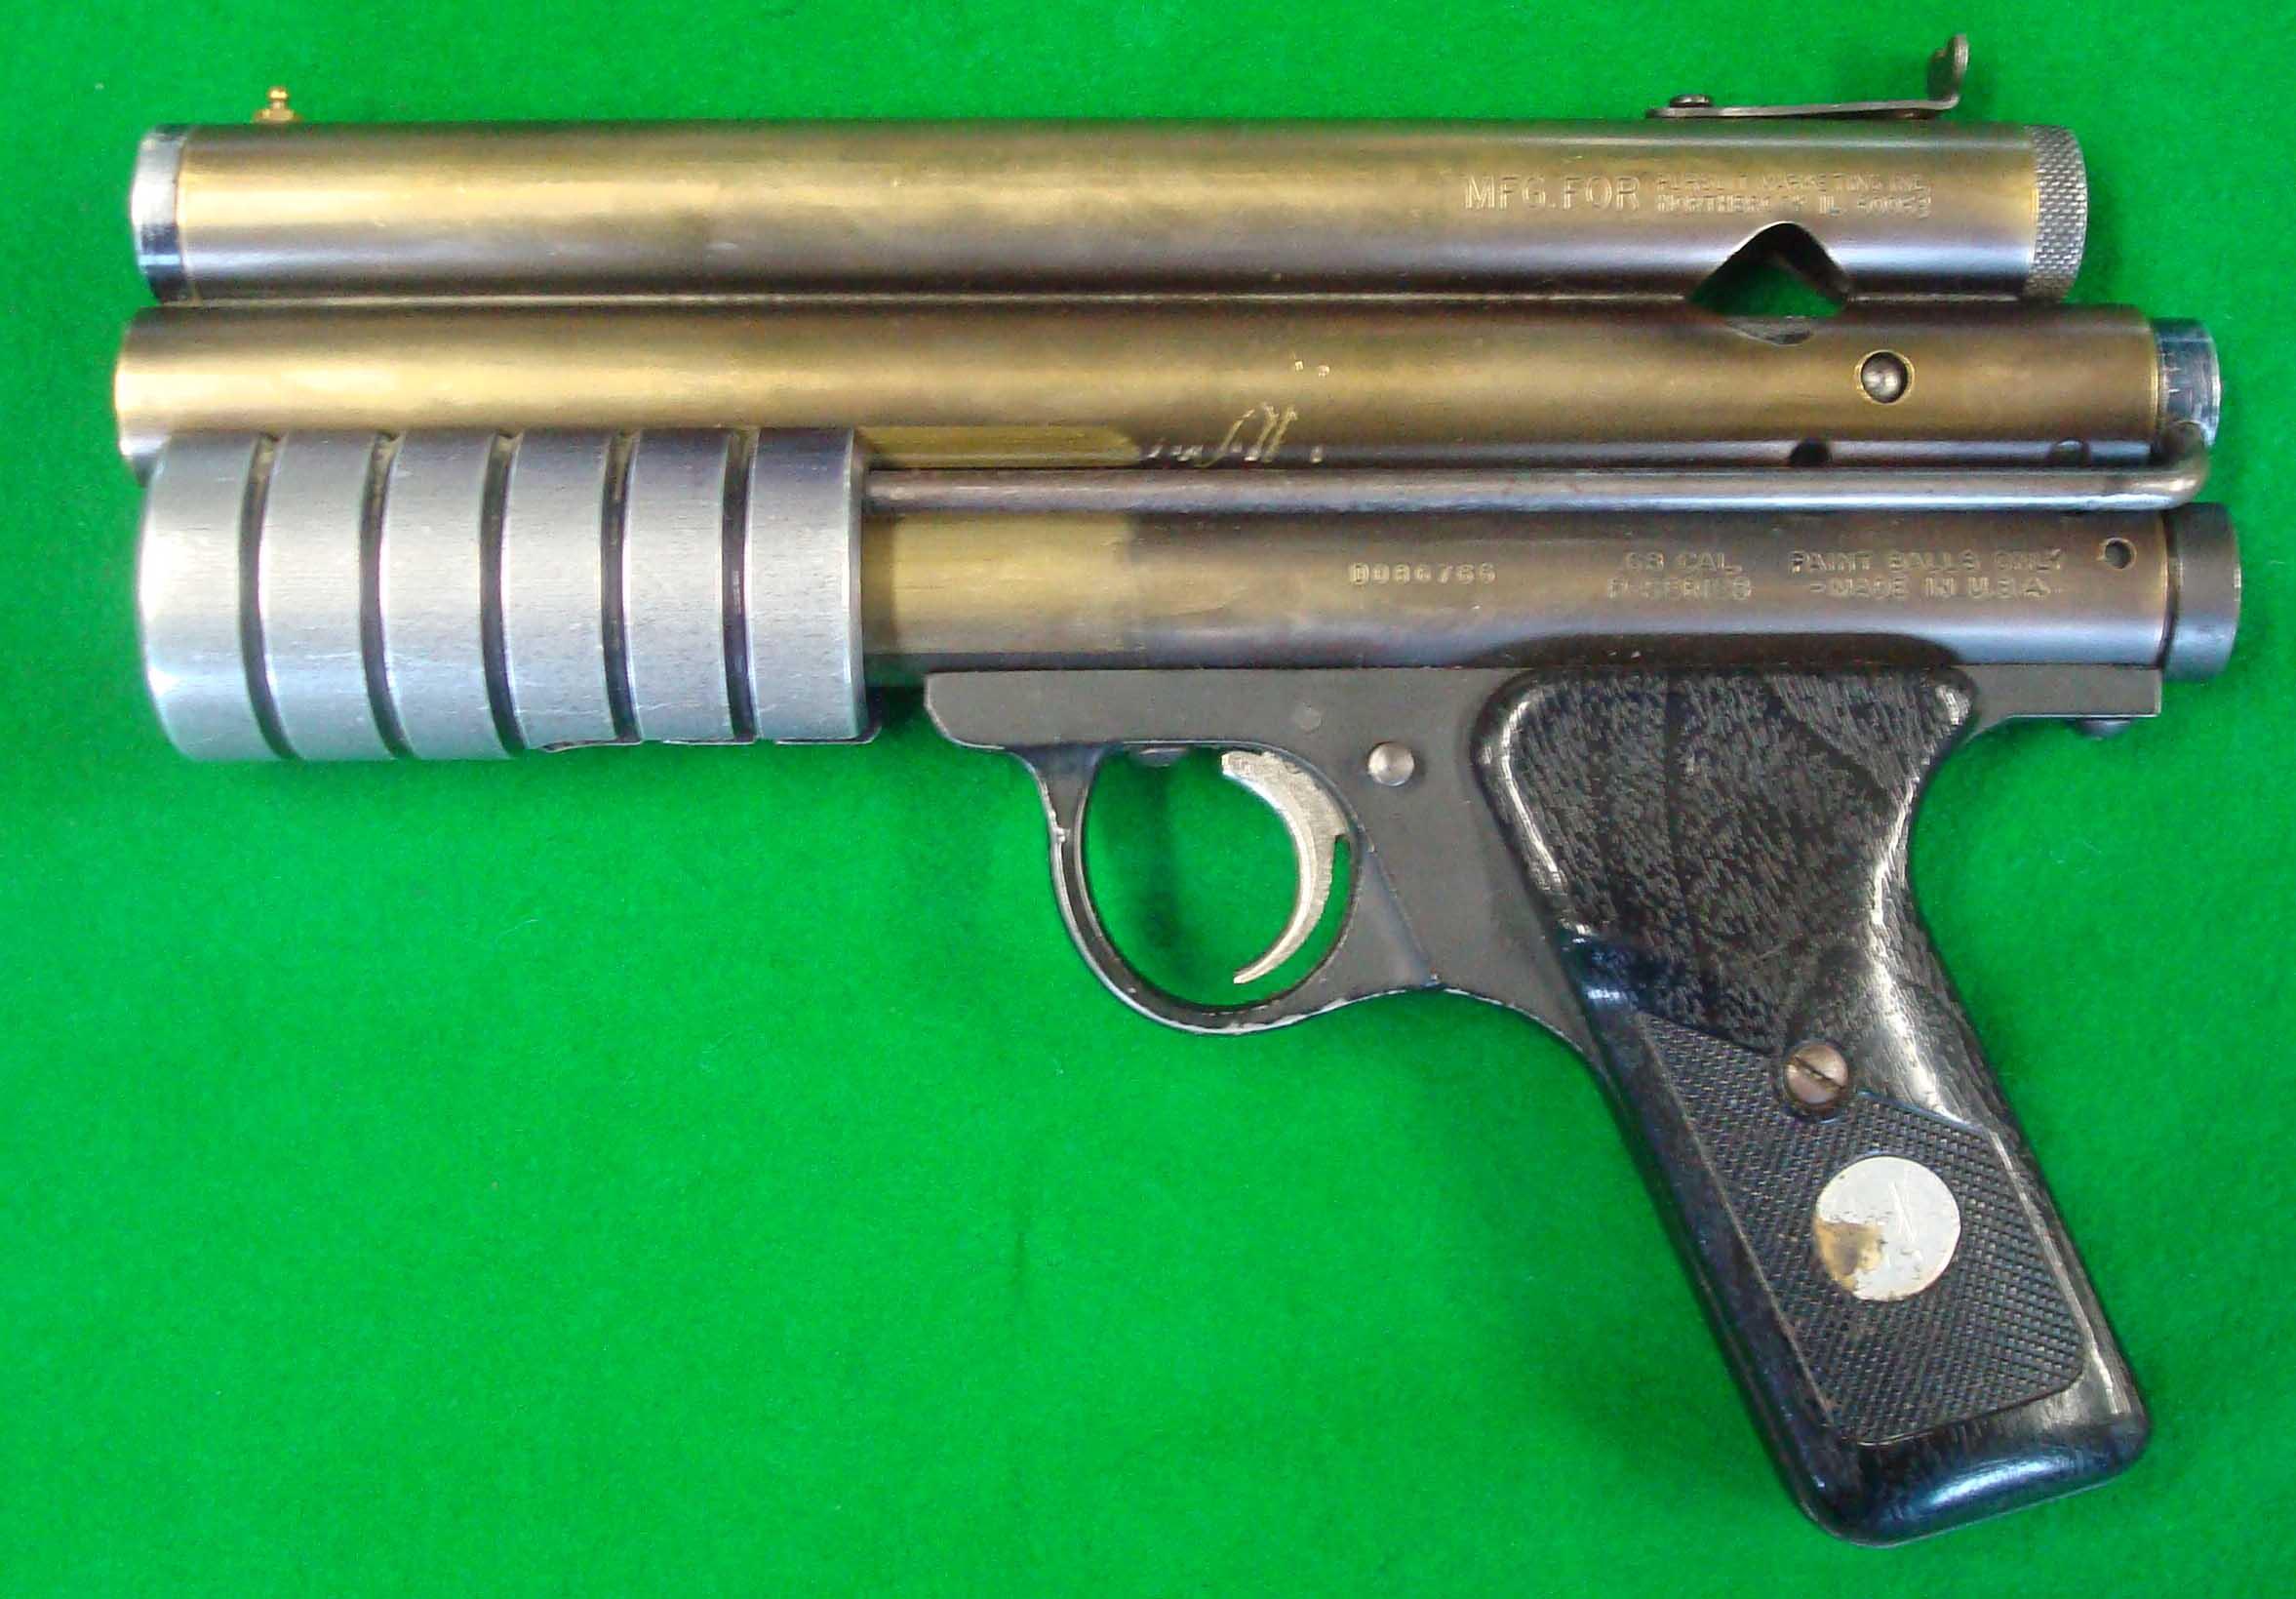 Benjamin Sheridan Corp model PGP Pump Paintball Pistol: The